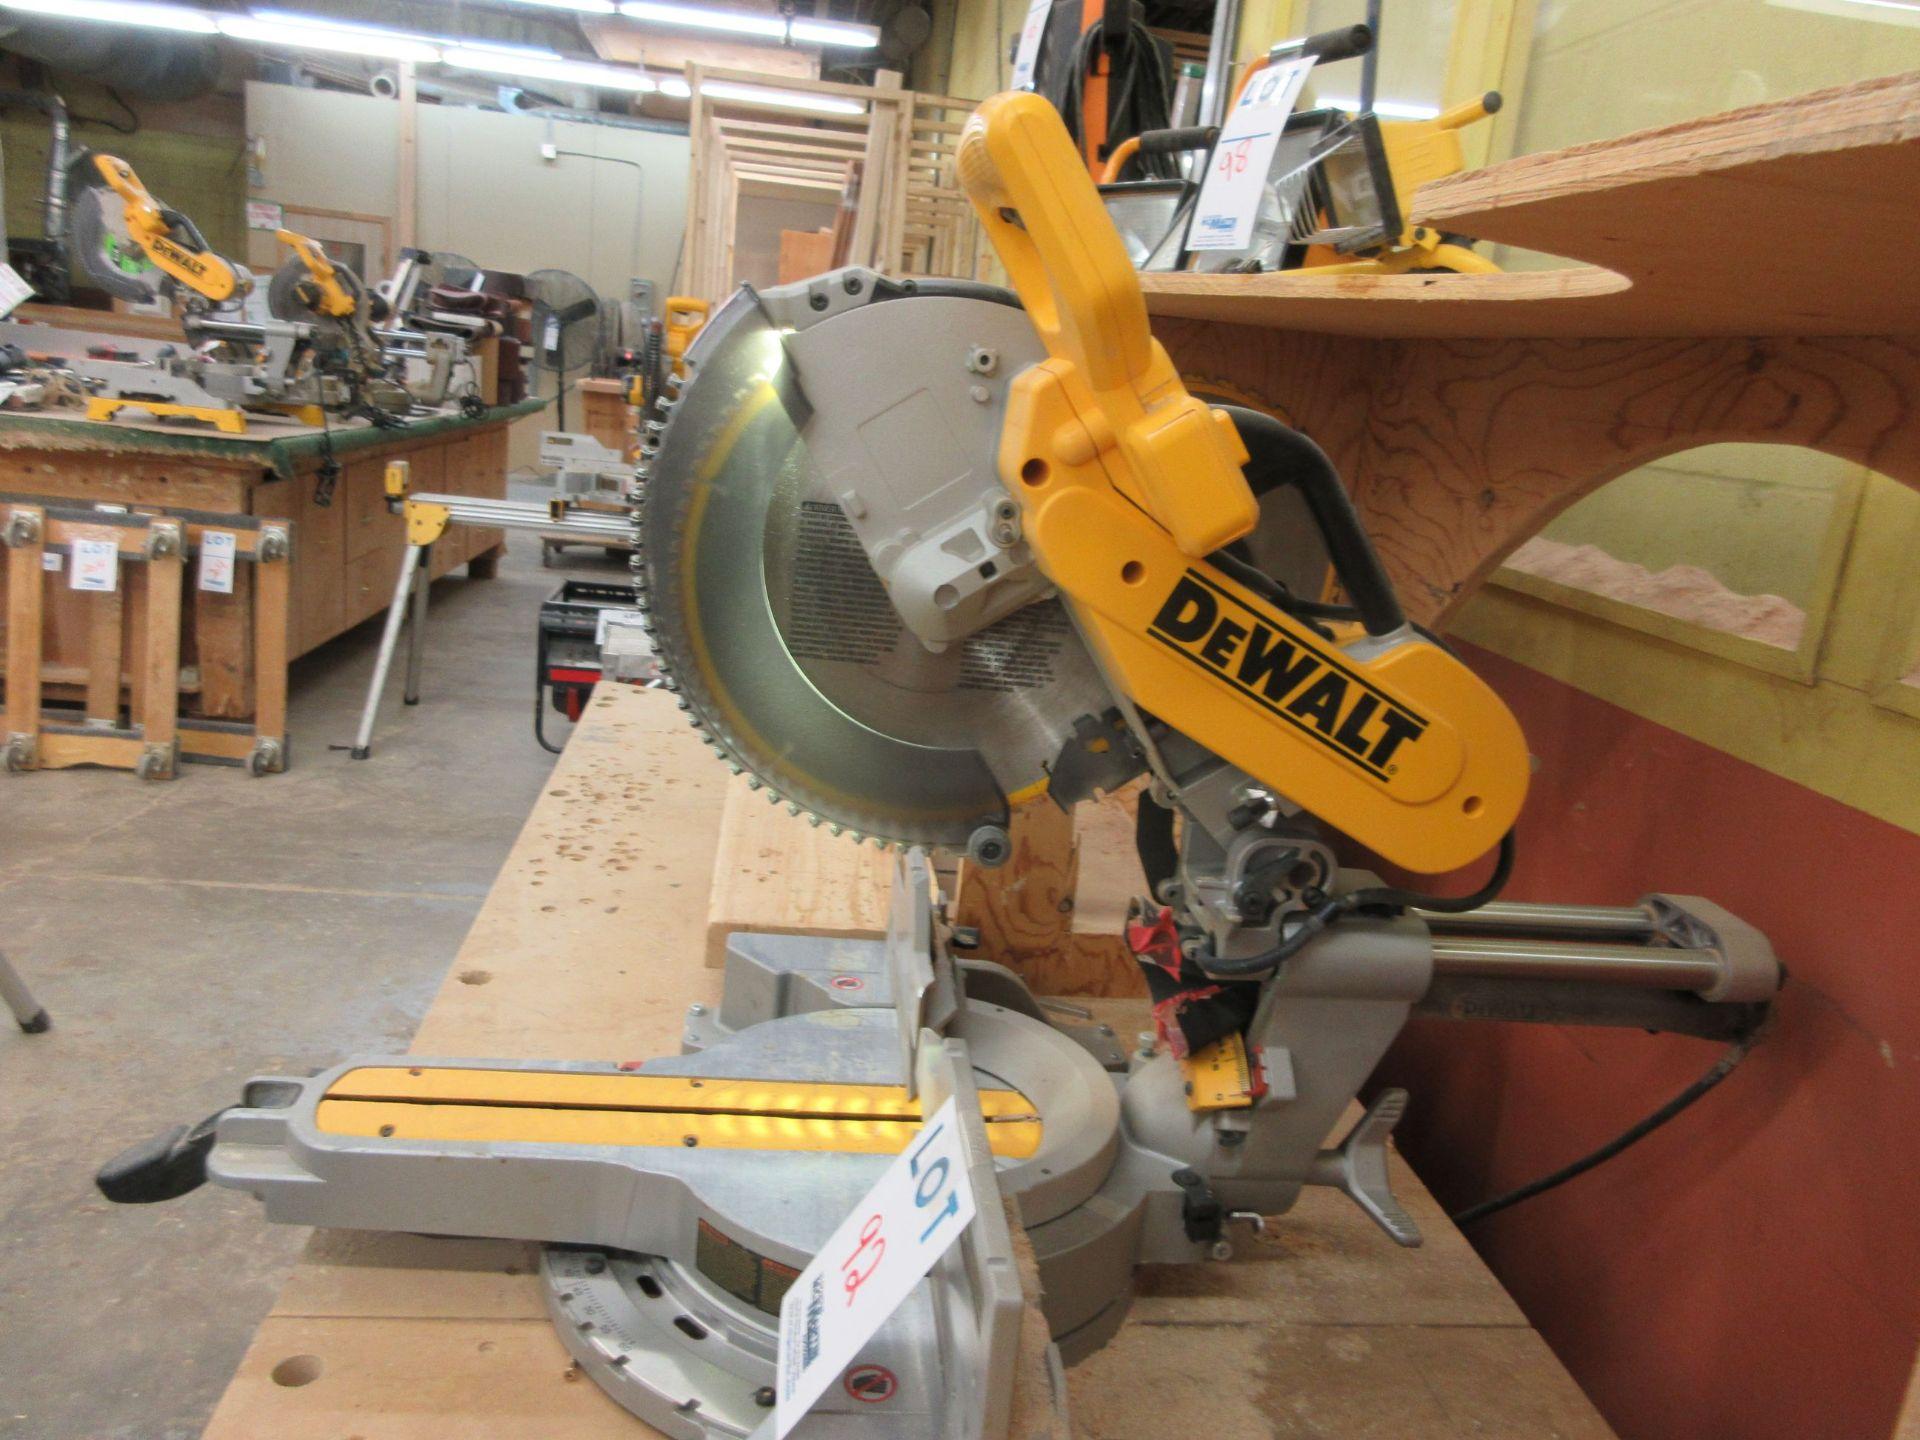 DEWALT miter saw Mod: DWS 780, c/w work cabinet - Image 3 of 5